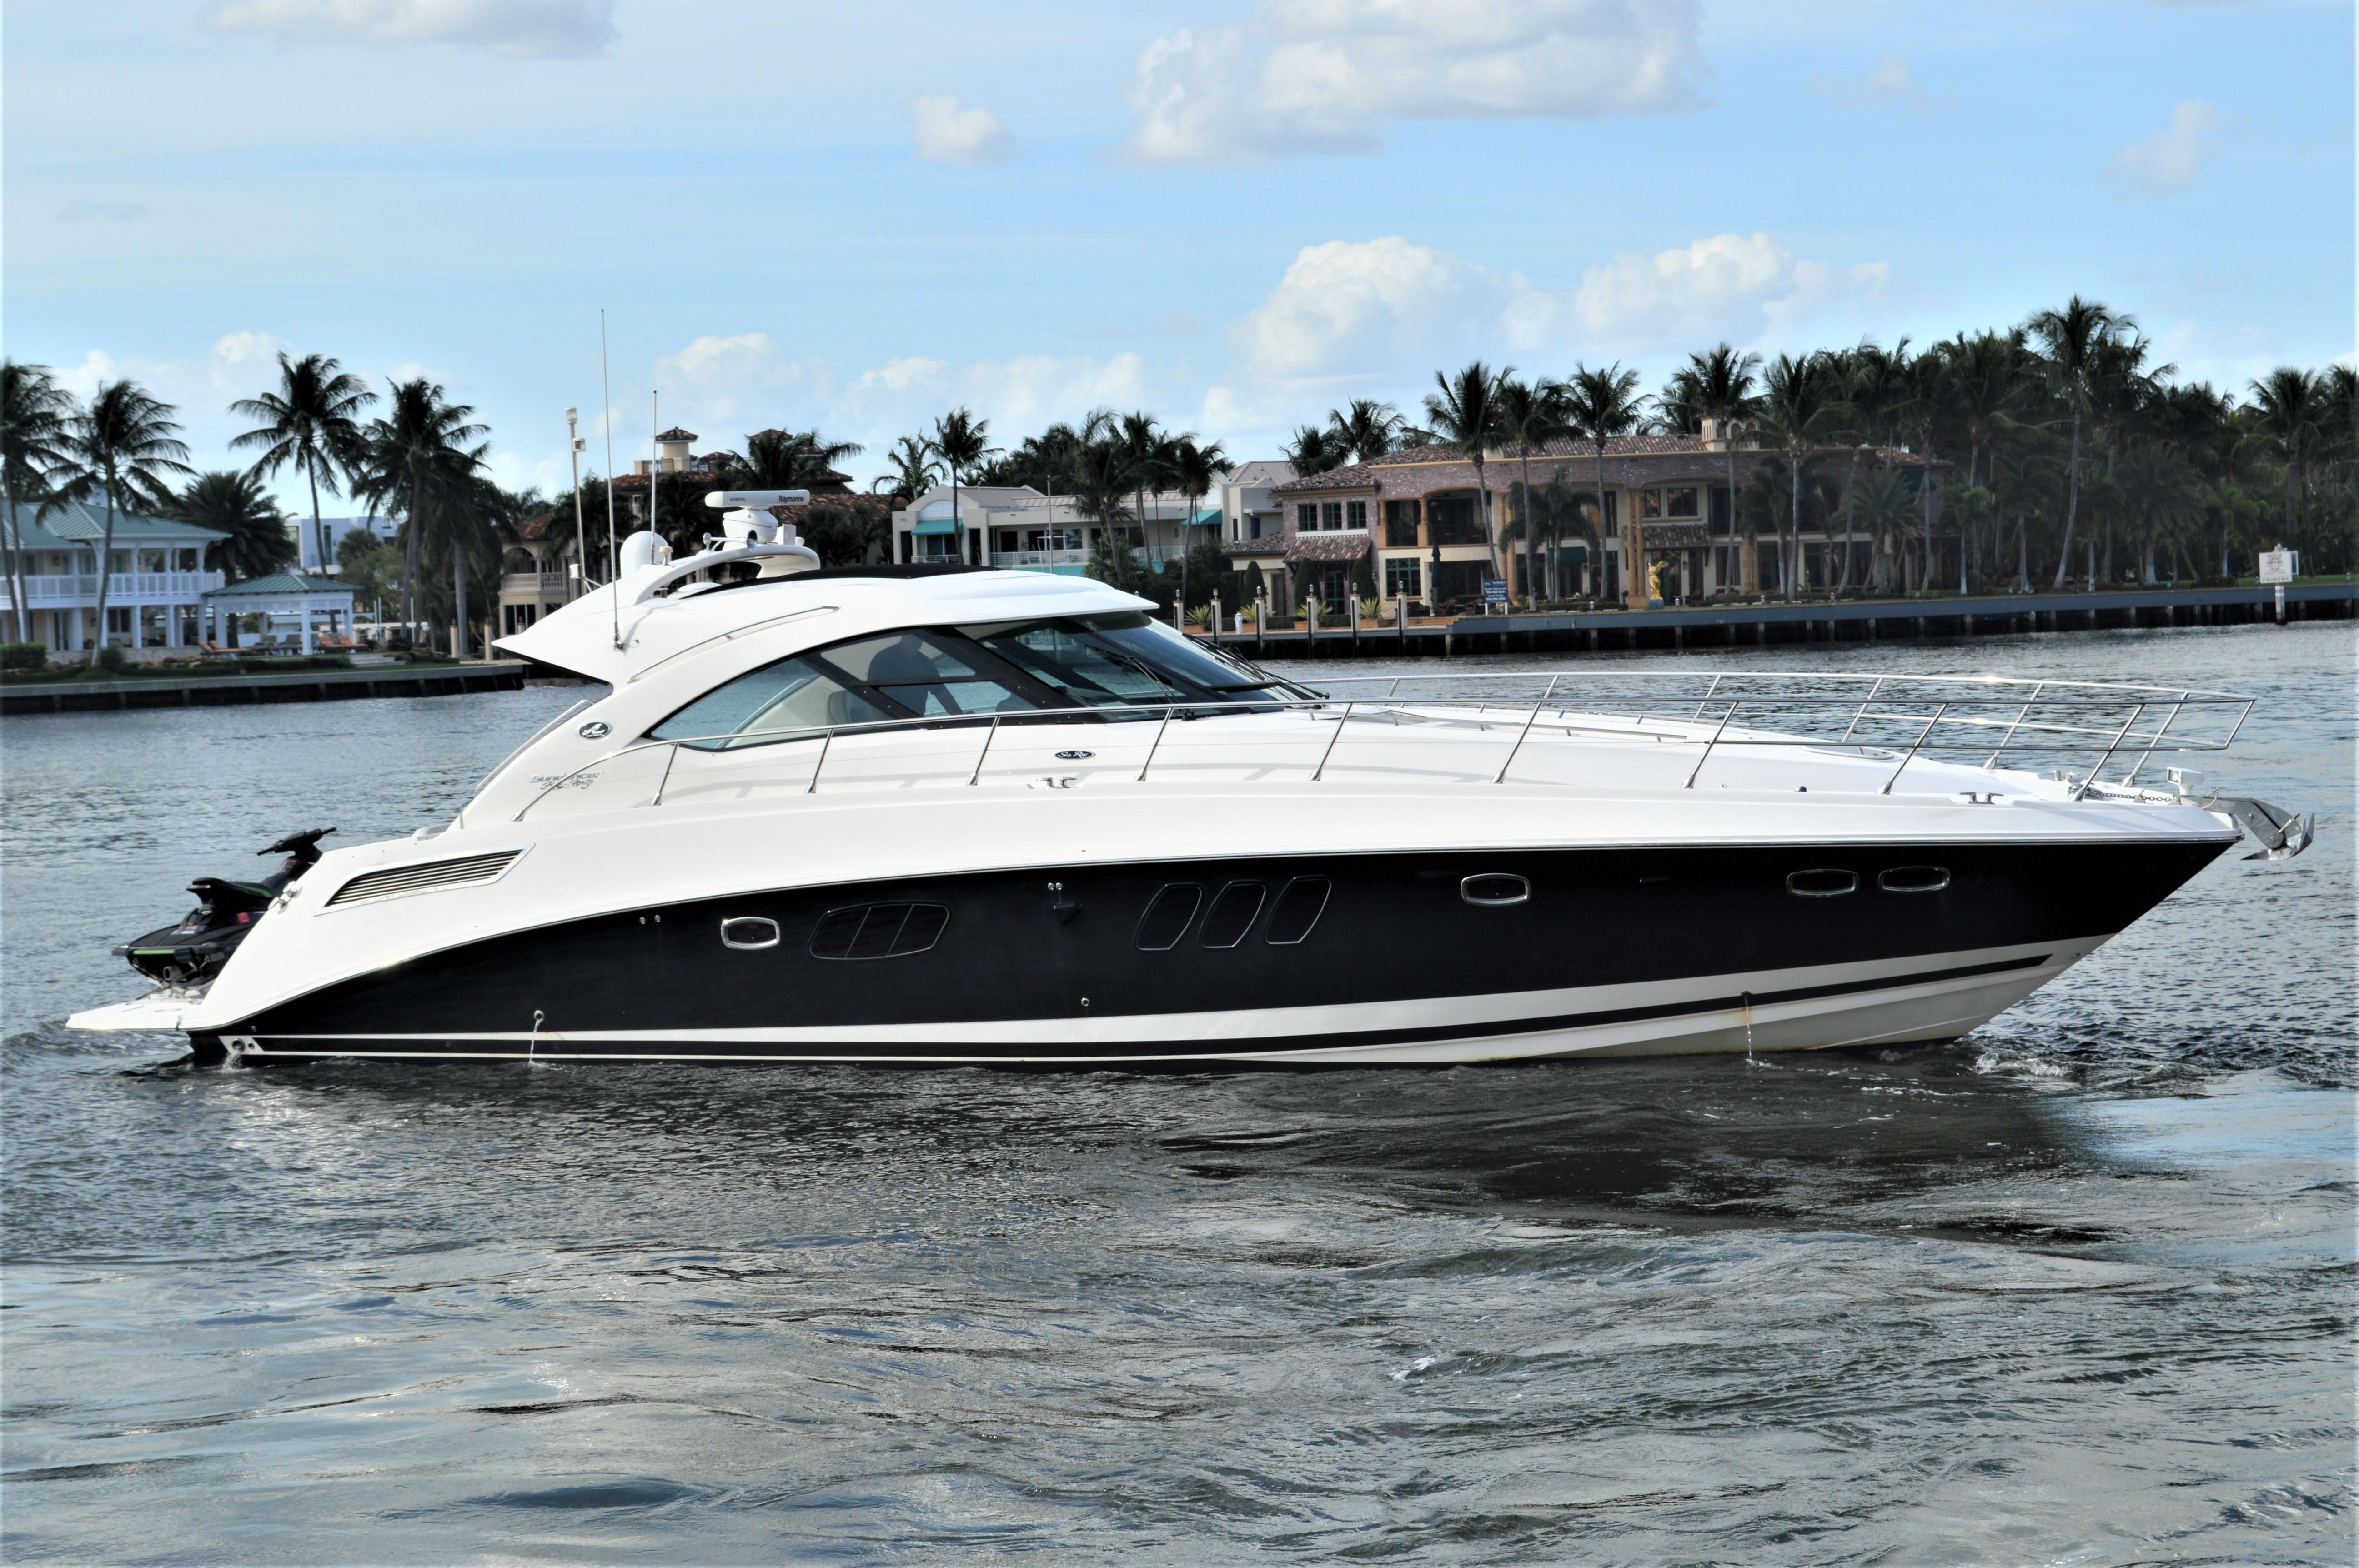 2012 Sea Ray 540 Lazy Blum - Profile